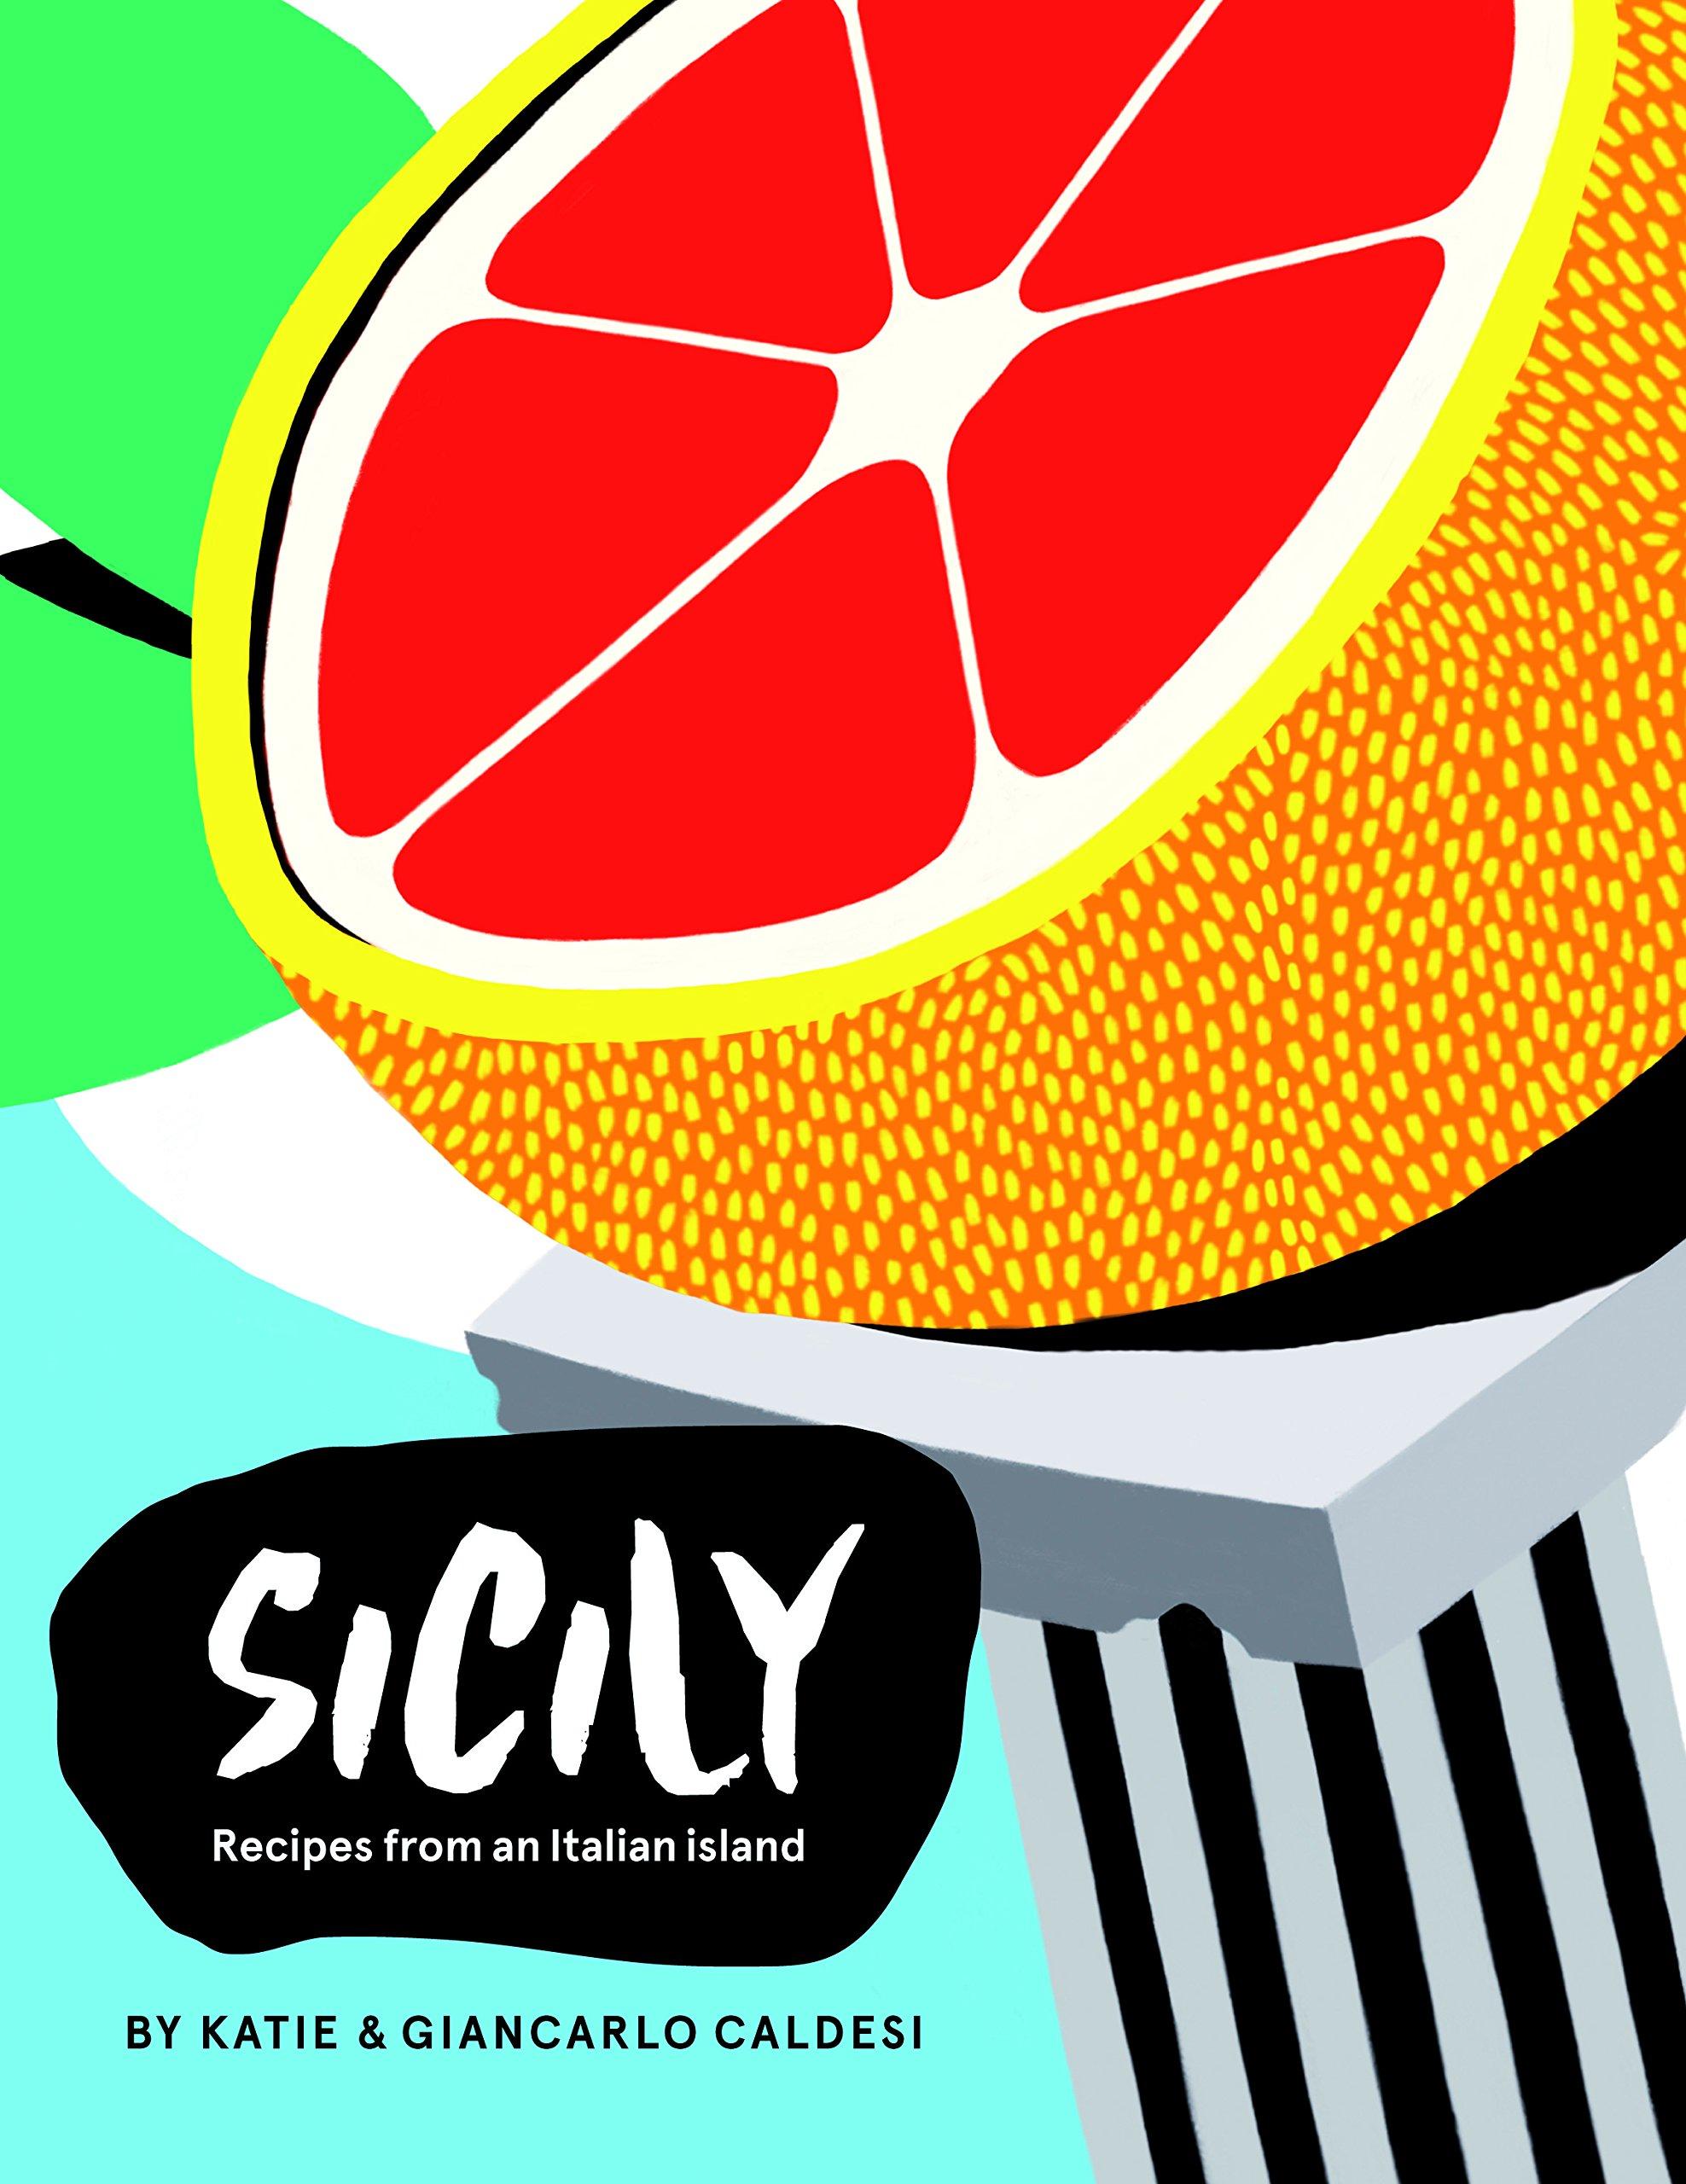 Sicily: Recipes from an Italian island by imusti